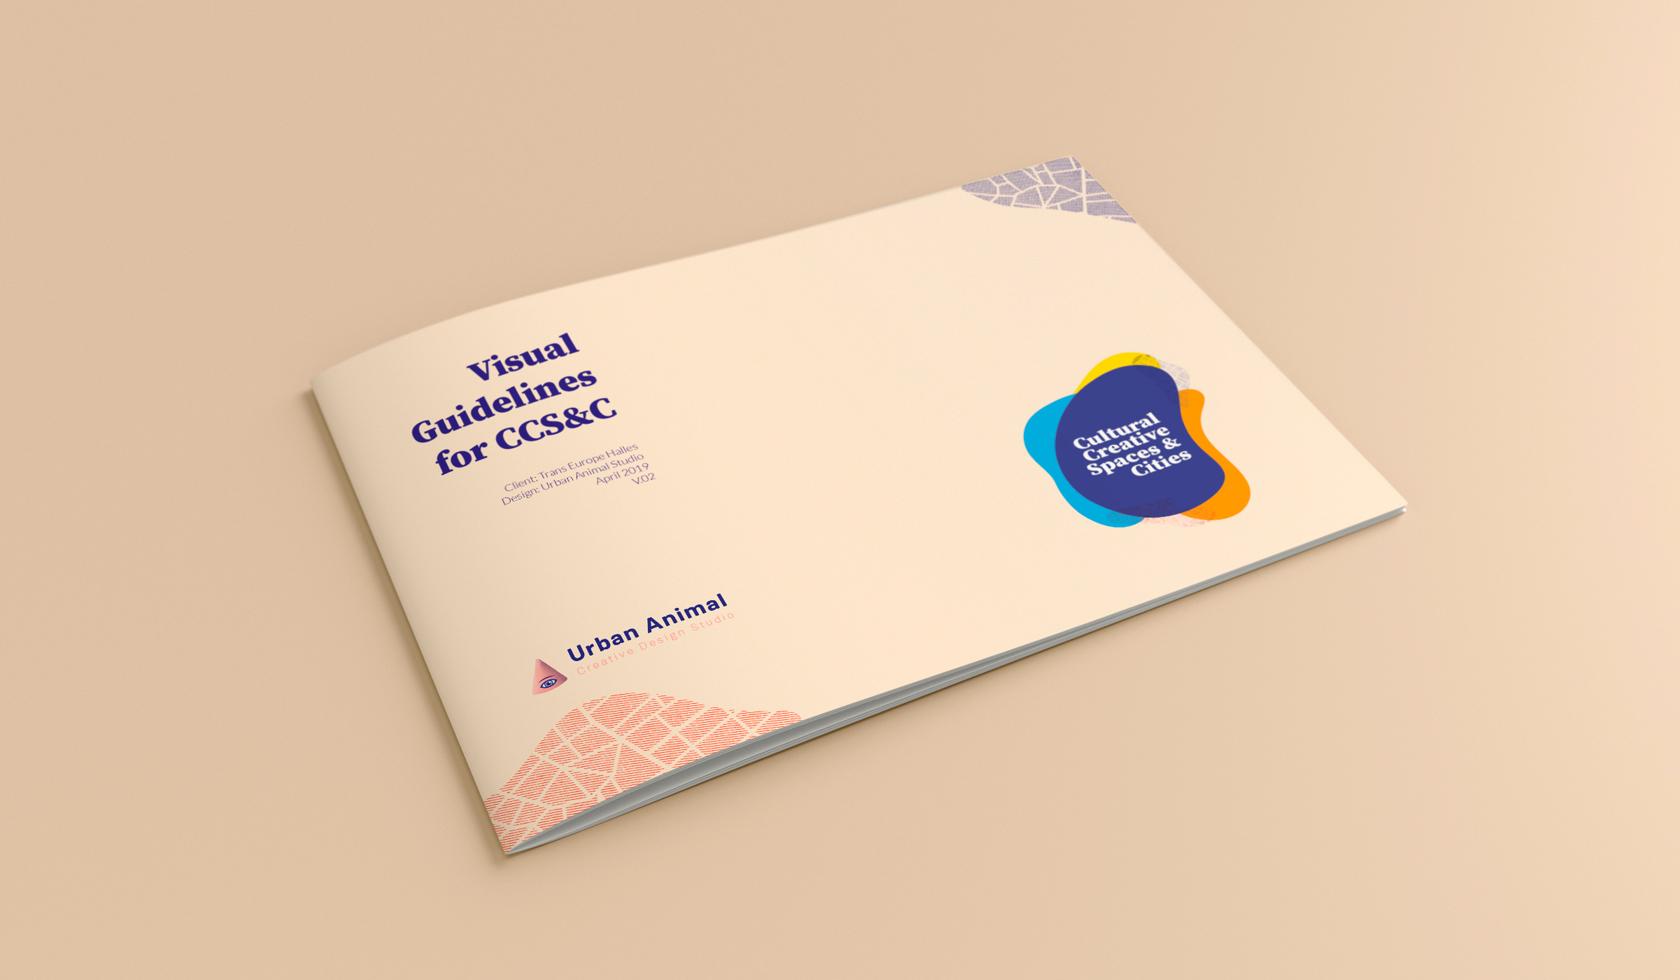 Cultural Creative Spaces & Cities grafiska profil och manual